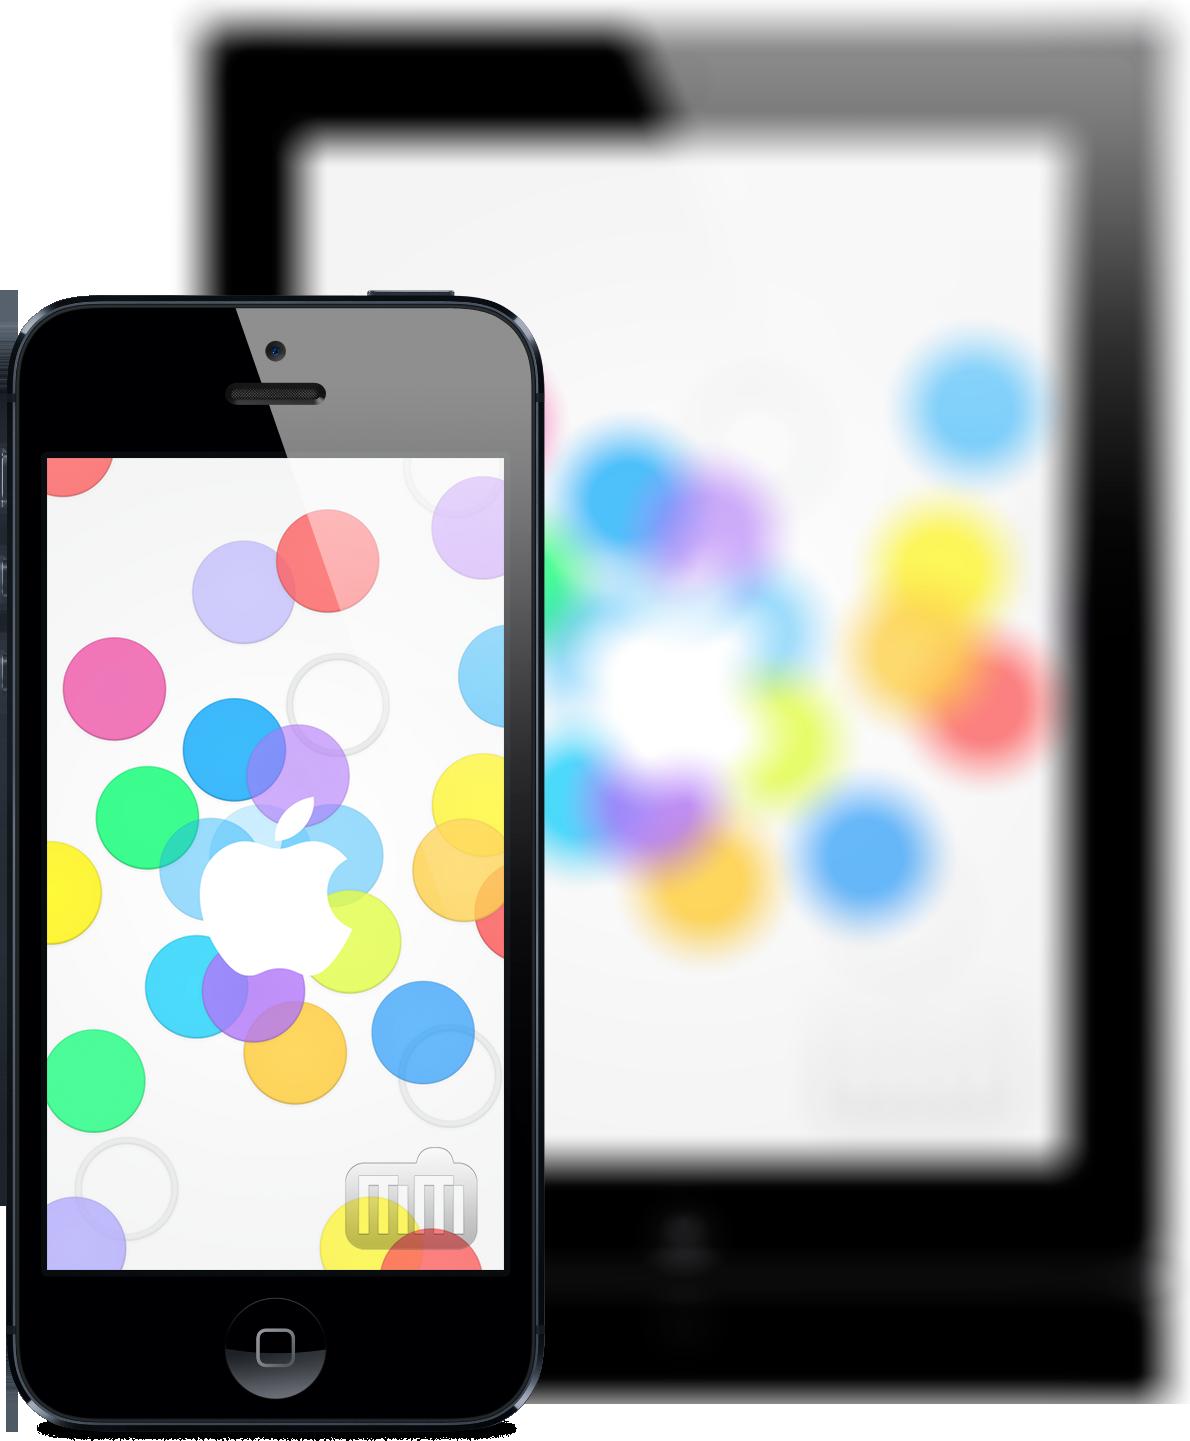 Wallpapers do evento especial da Apple